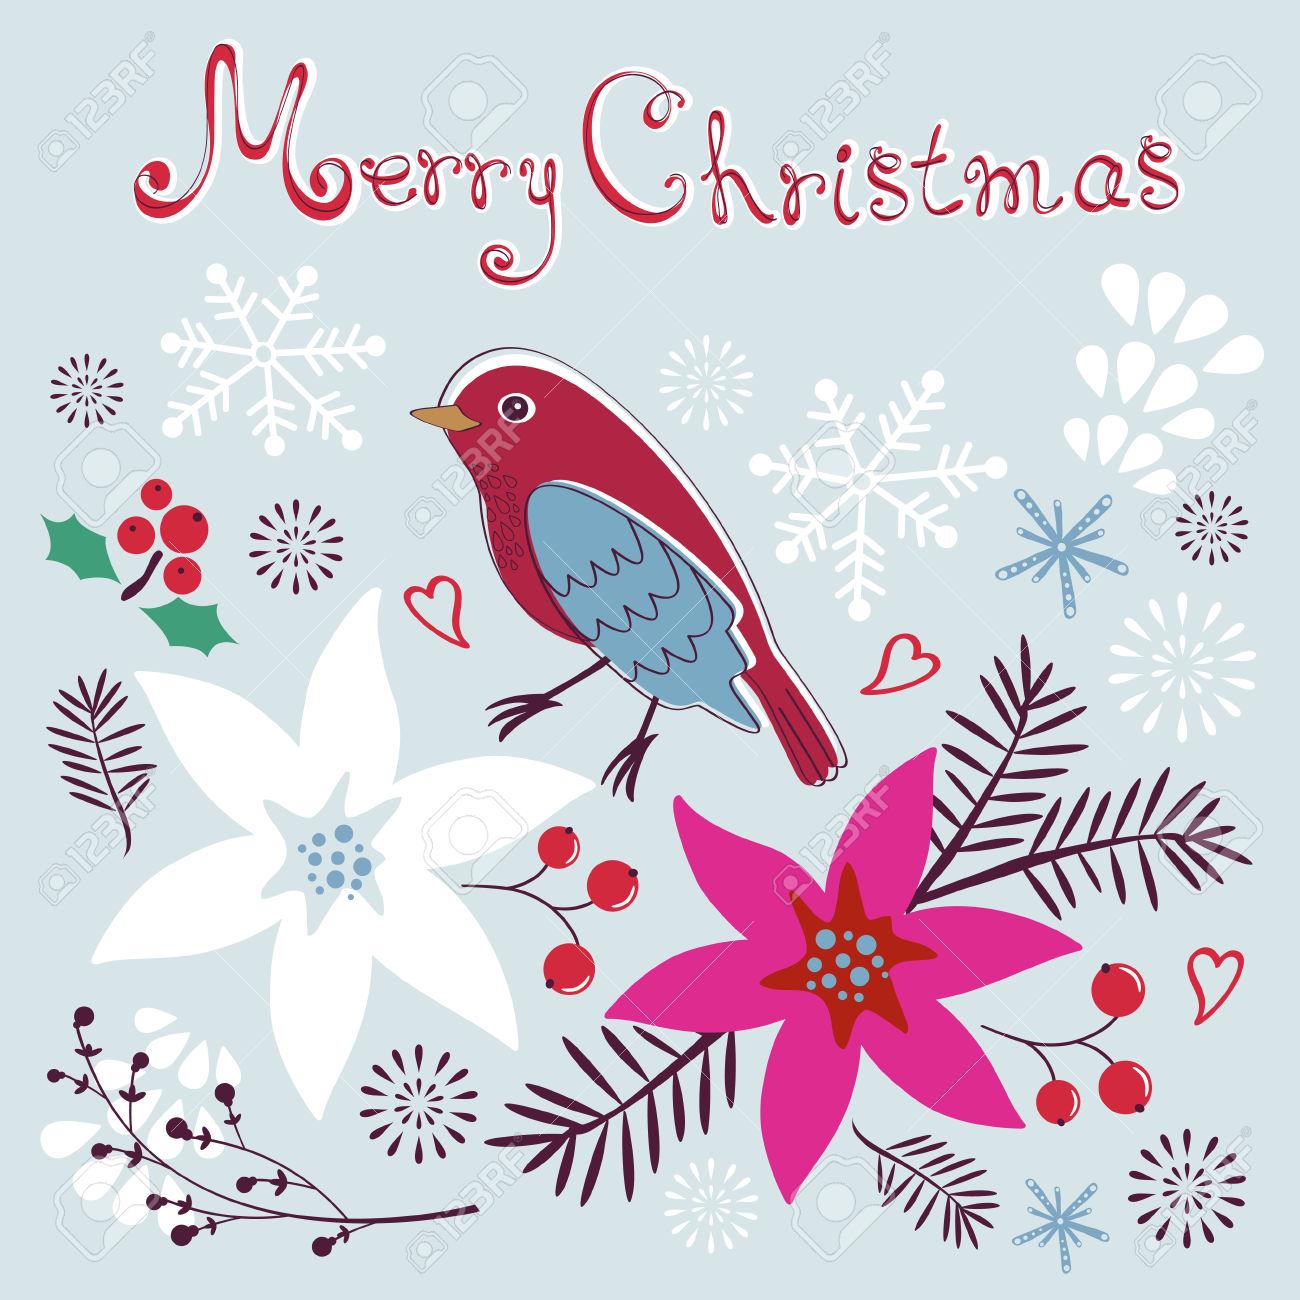 Christmas por navidad creciendoentreflores - Tarjetas con motivos navidenos ...